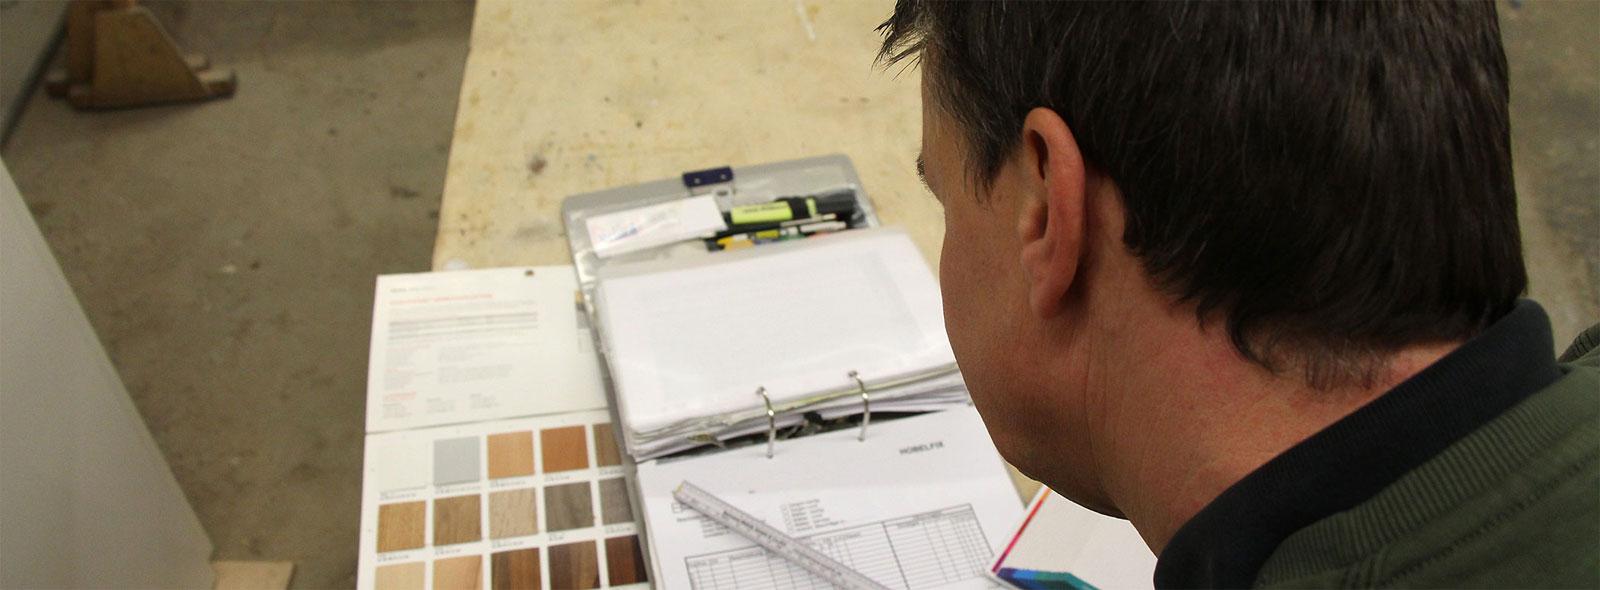 Innenausbau Planung und Gestaltung